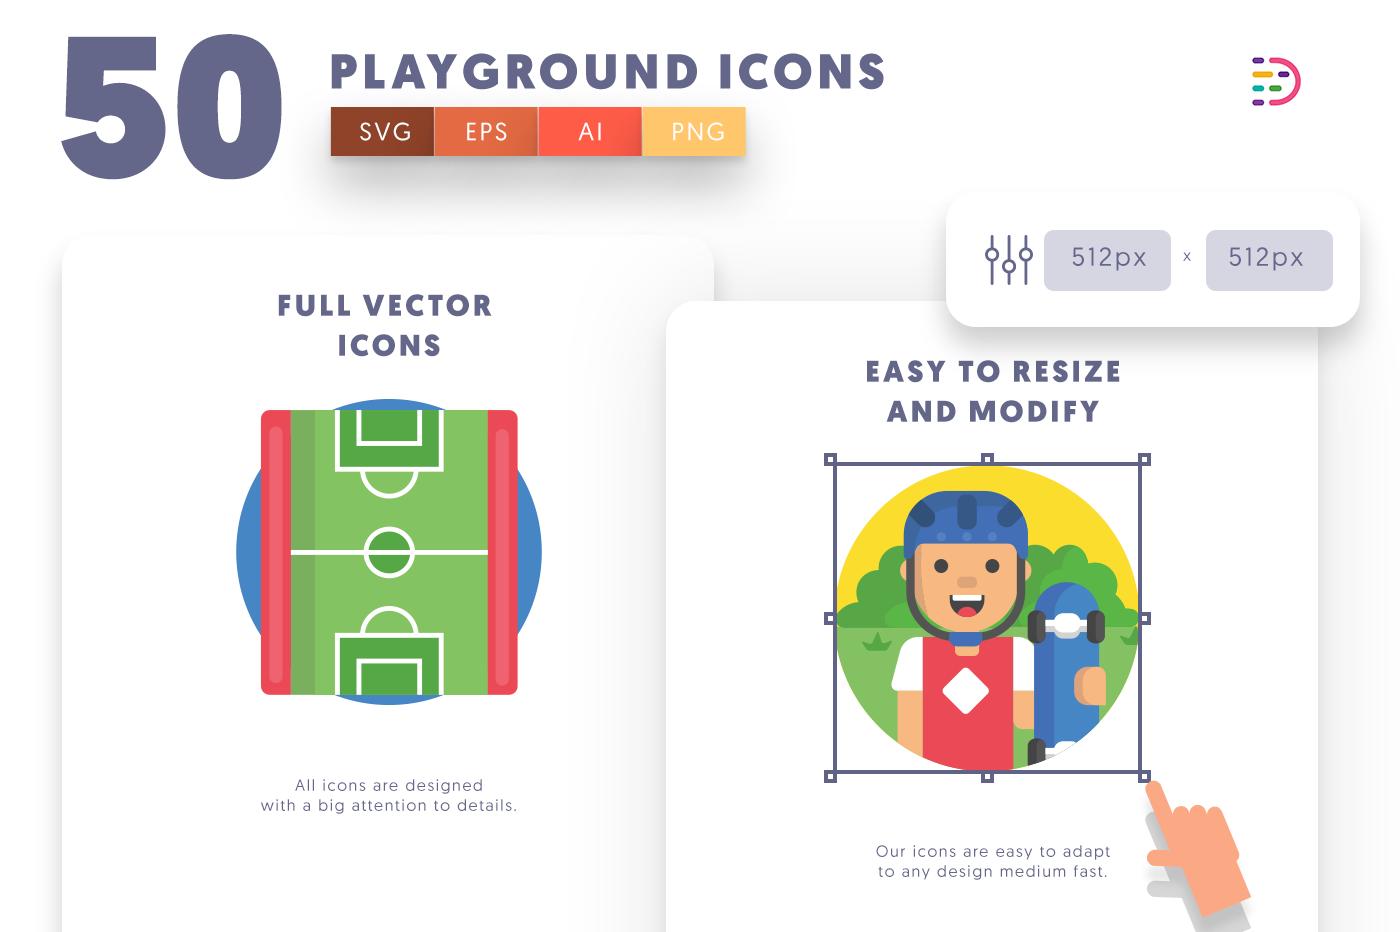 Full vector 50Playground Icons